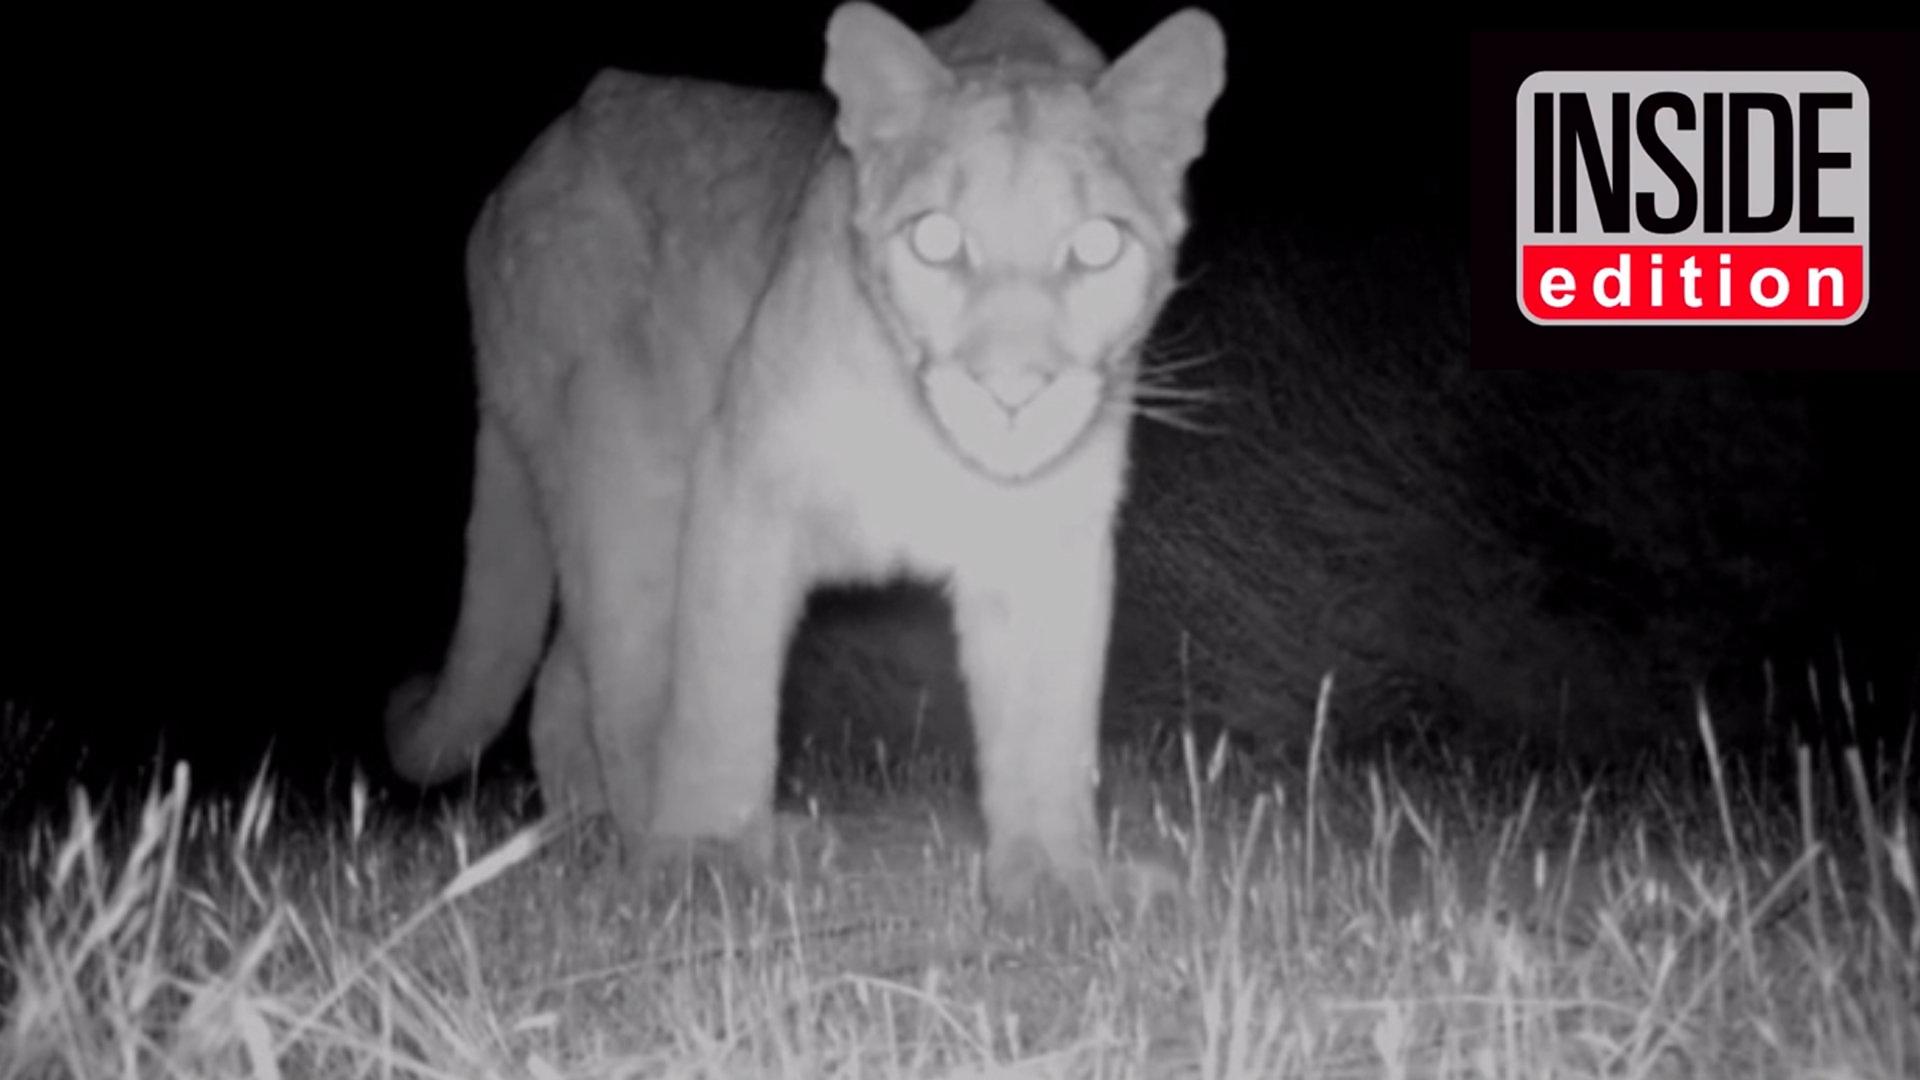 mountain-lion-video-image-no-title